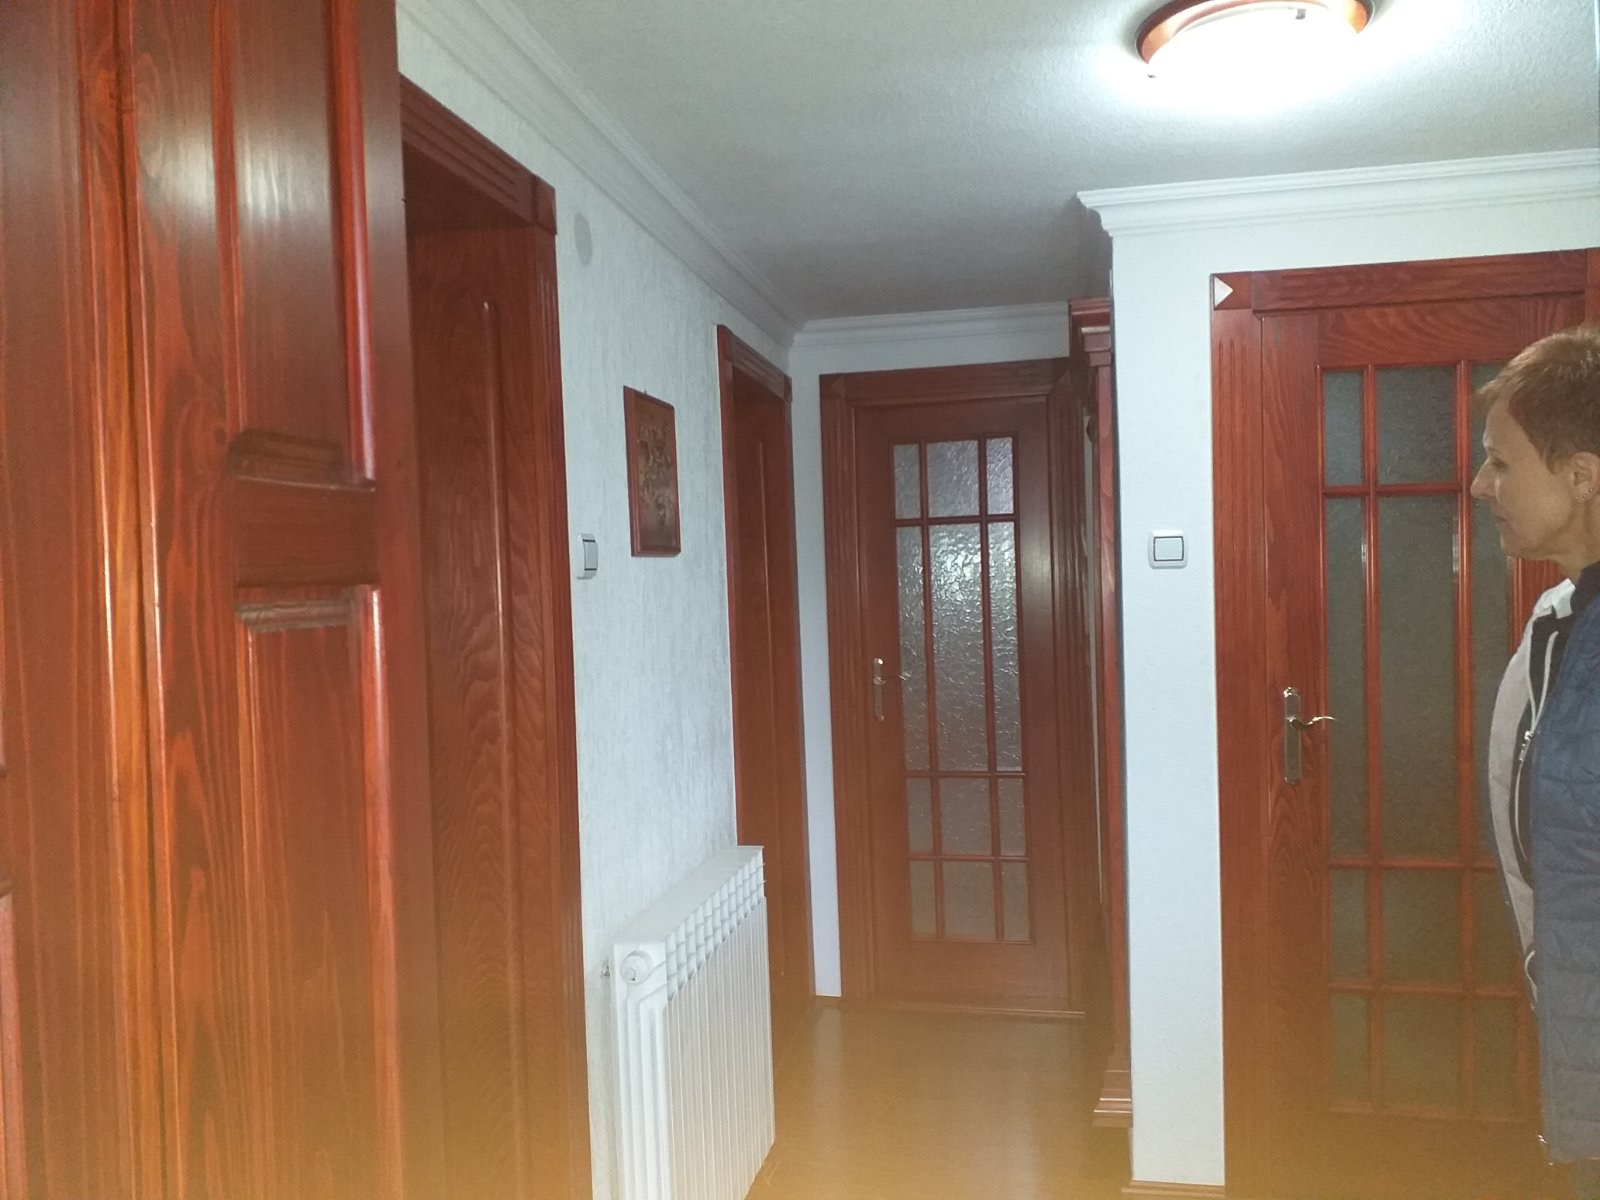 Prizemna extra kuća 150 m2, plac 21 x 85 m, Stara Pazova